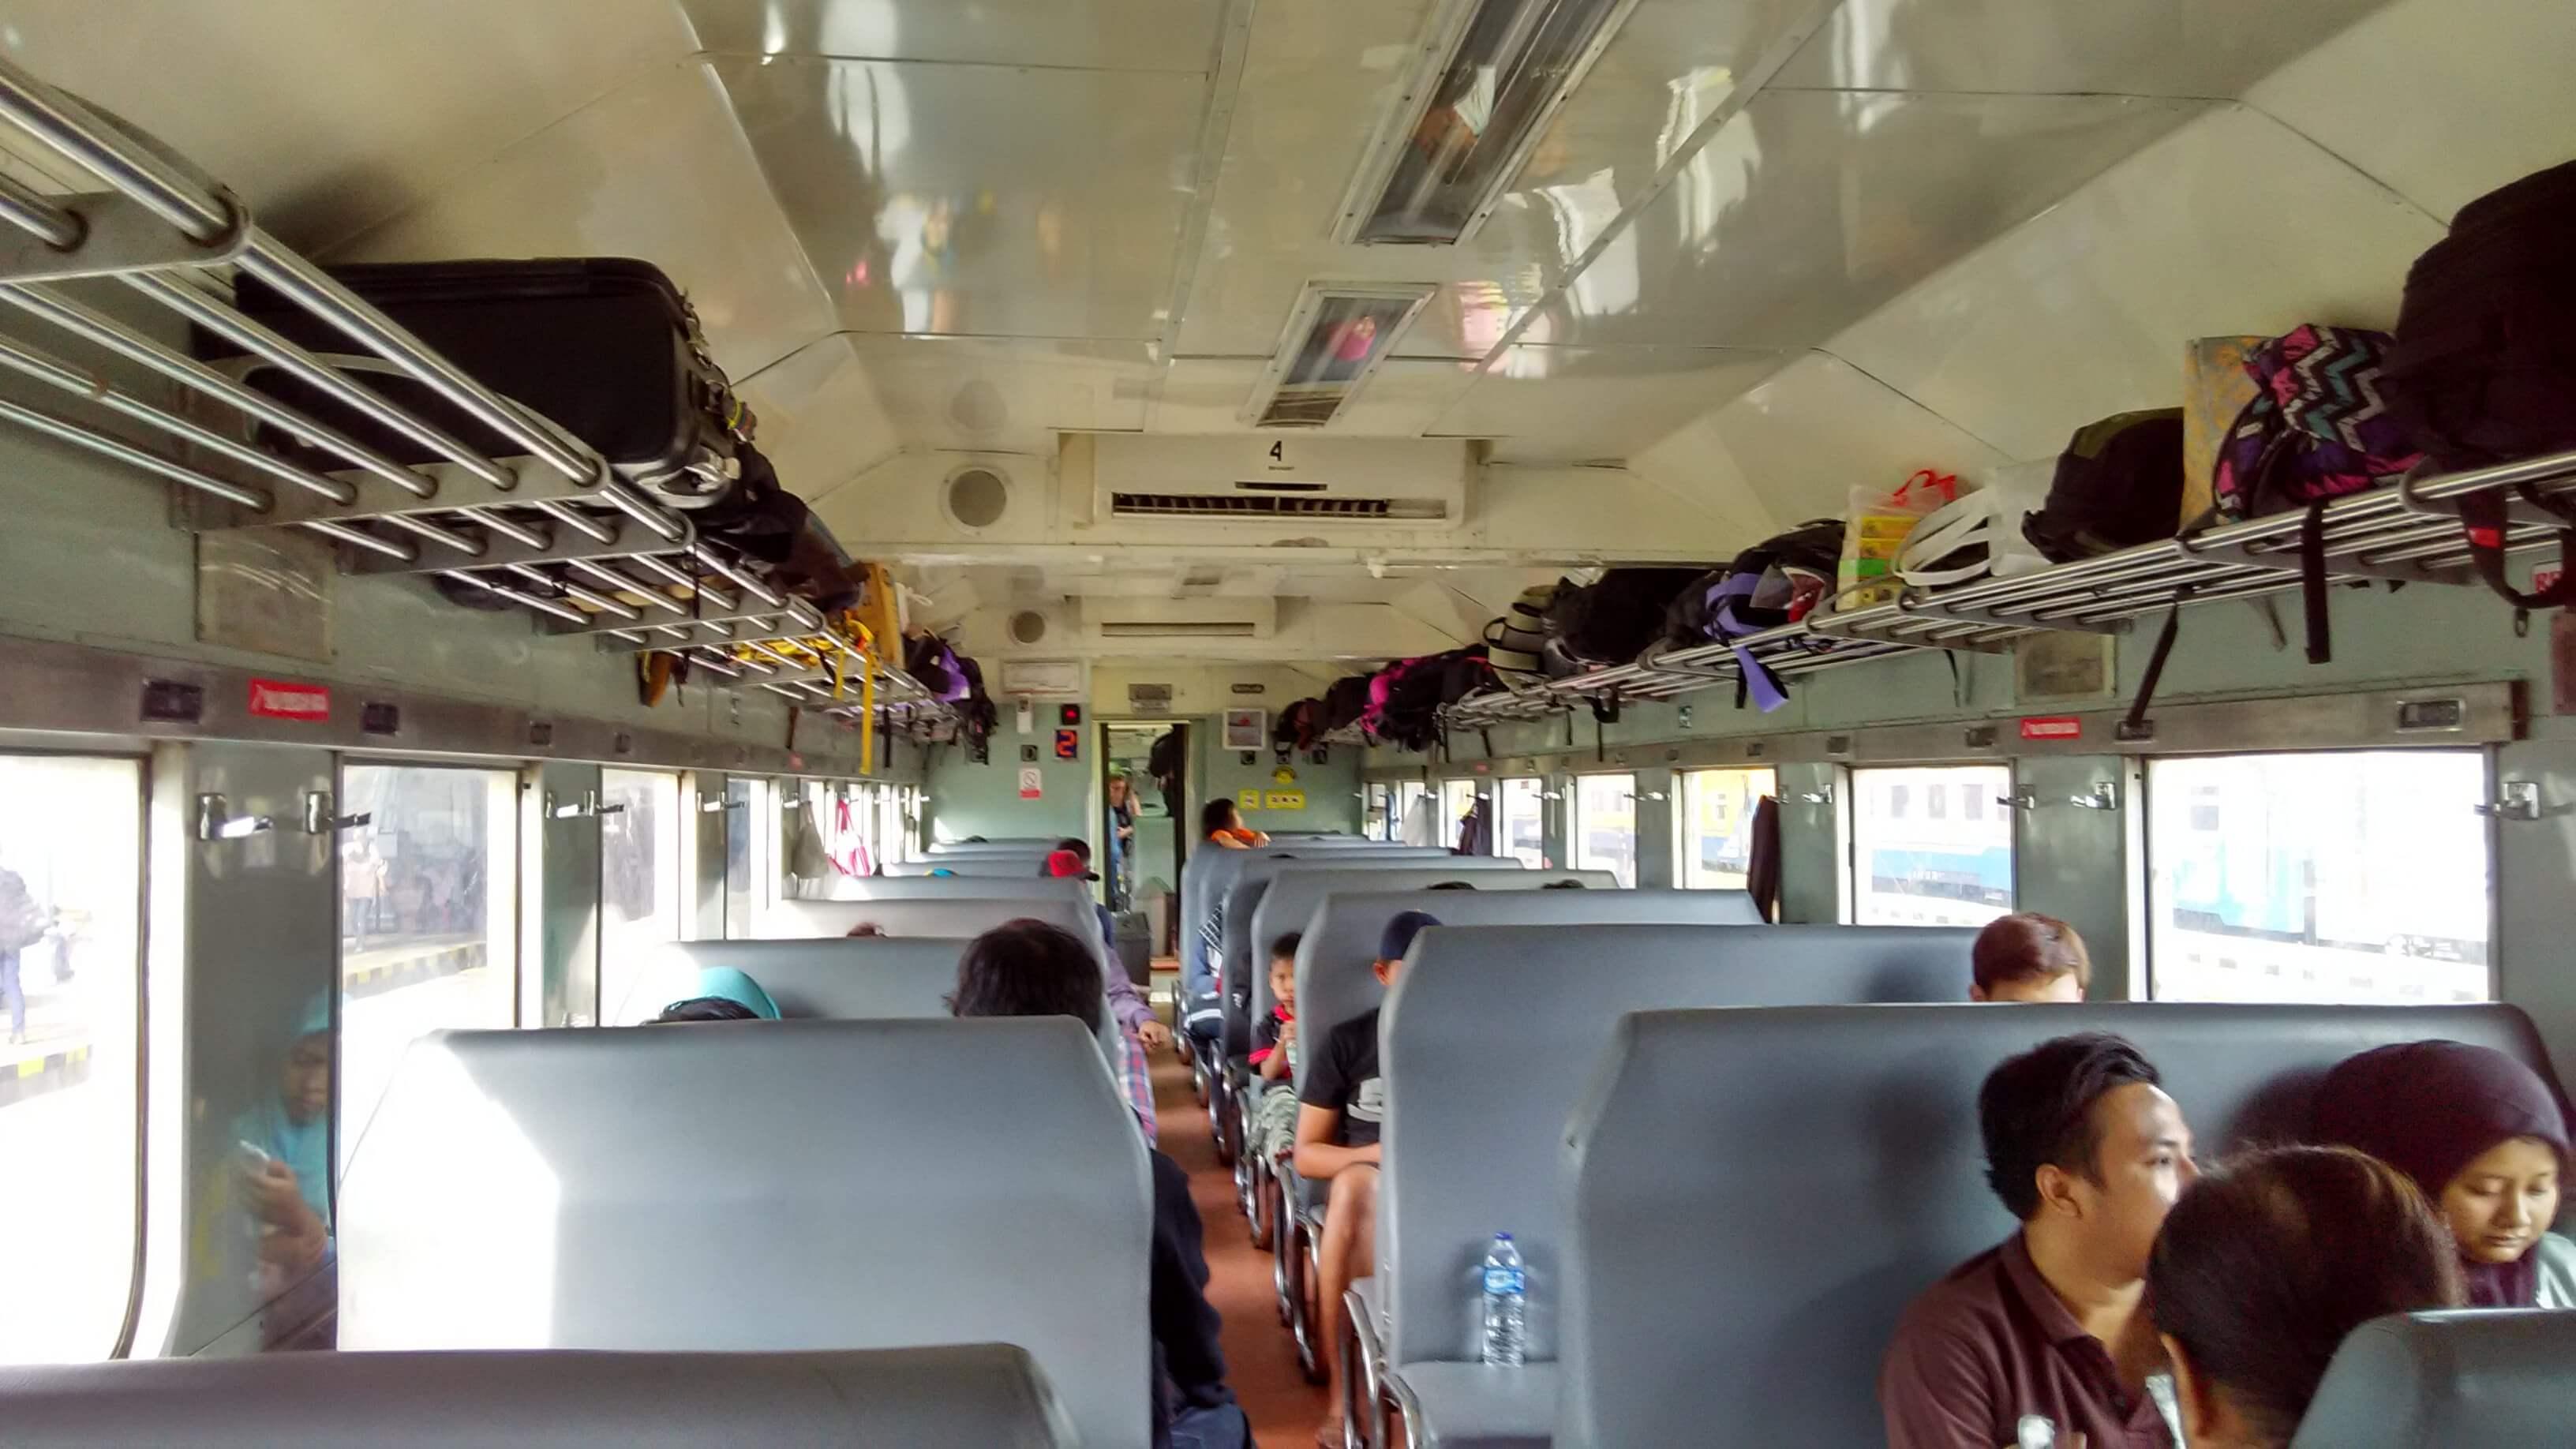 Kereta api Sri Tanjung riwayatmu kini.